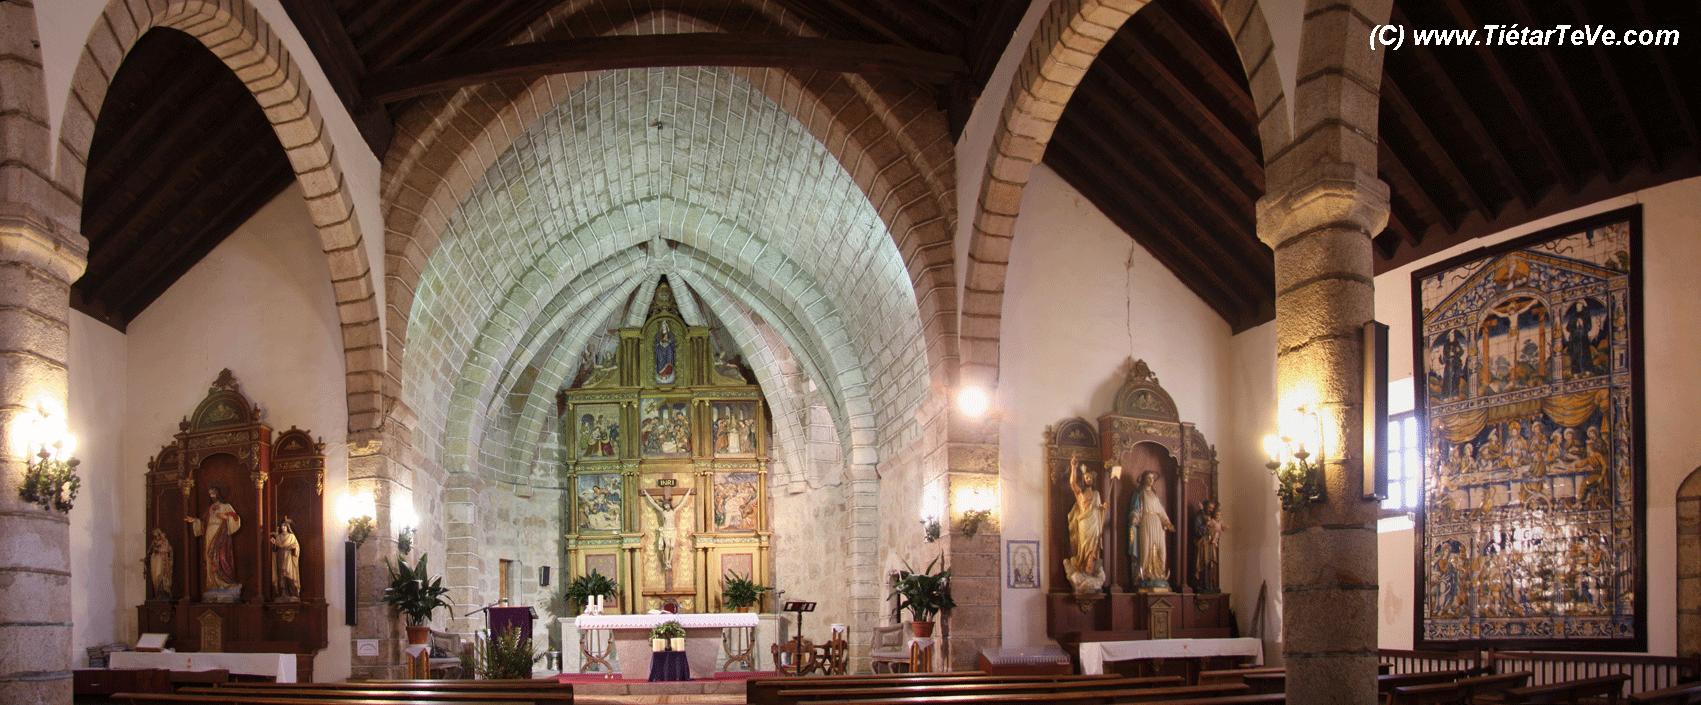 Bienes de Interés Cultural - Panorámica Interior Iglesia Candeleda